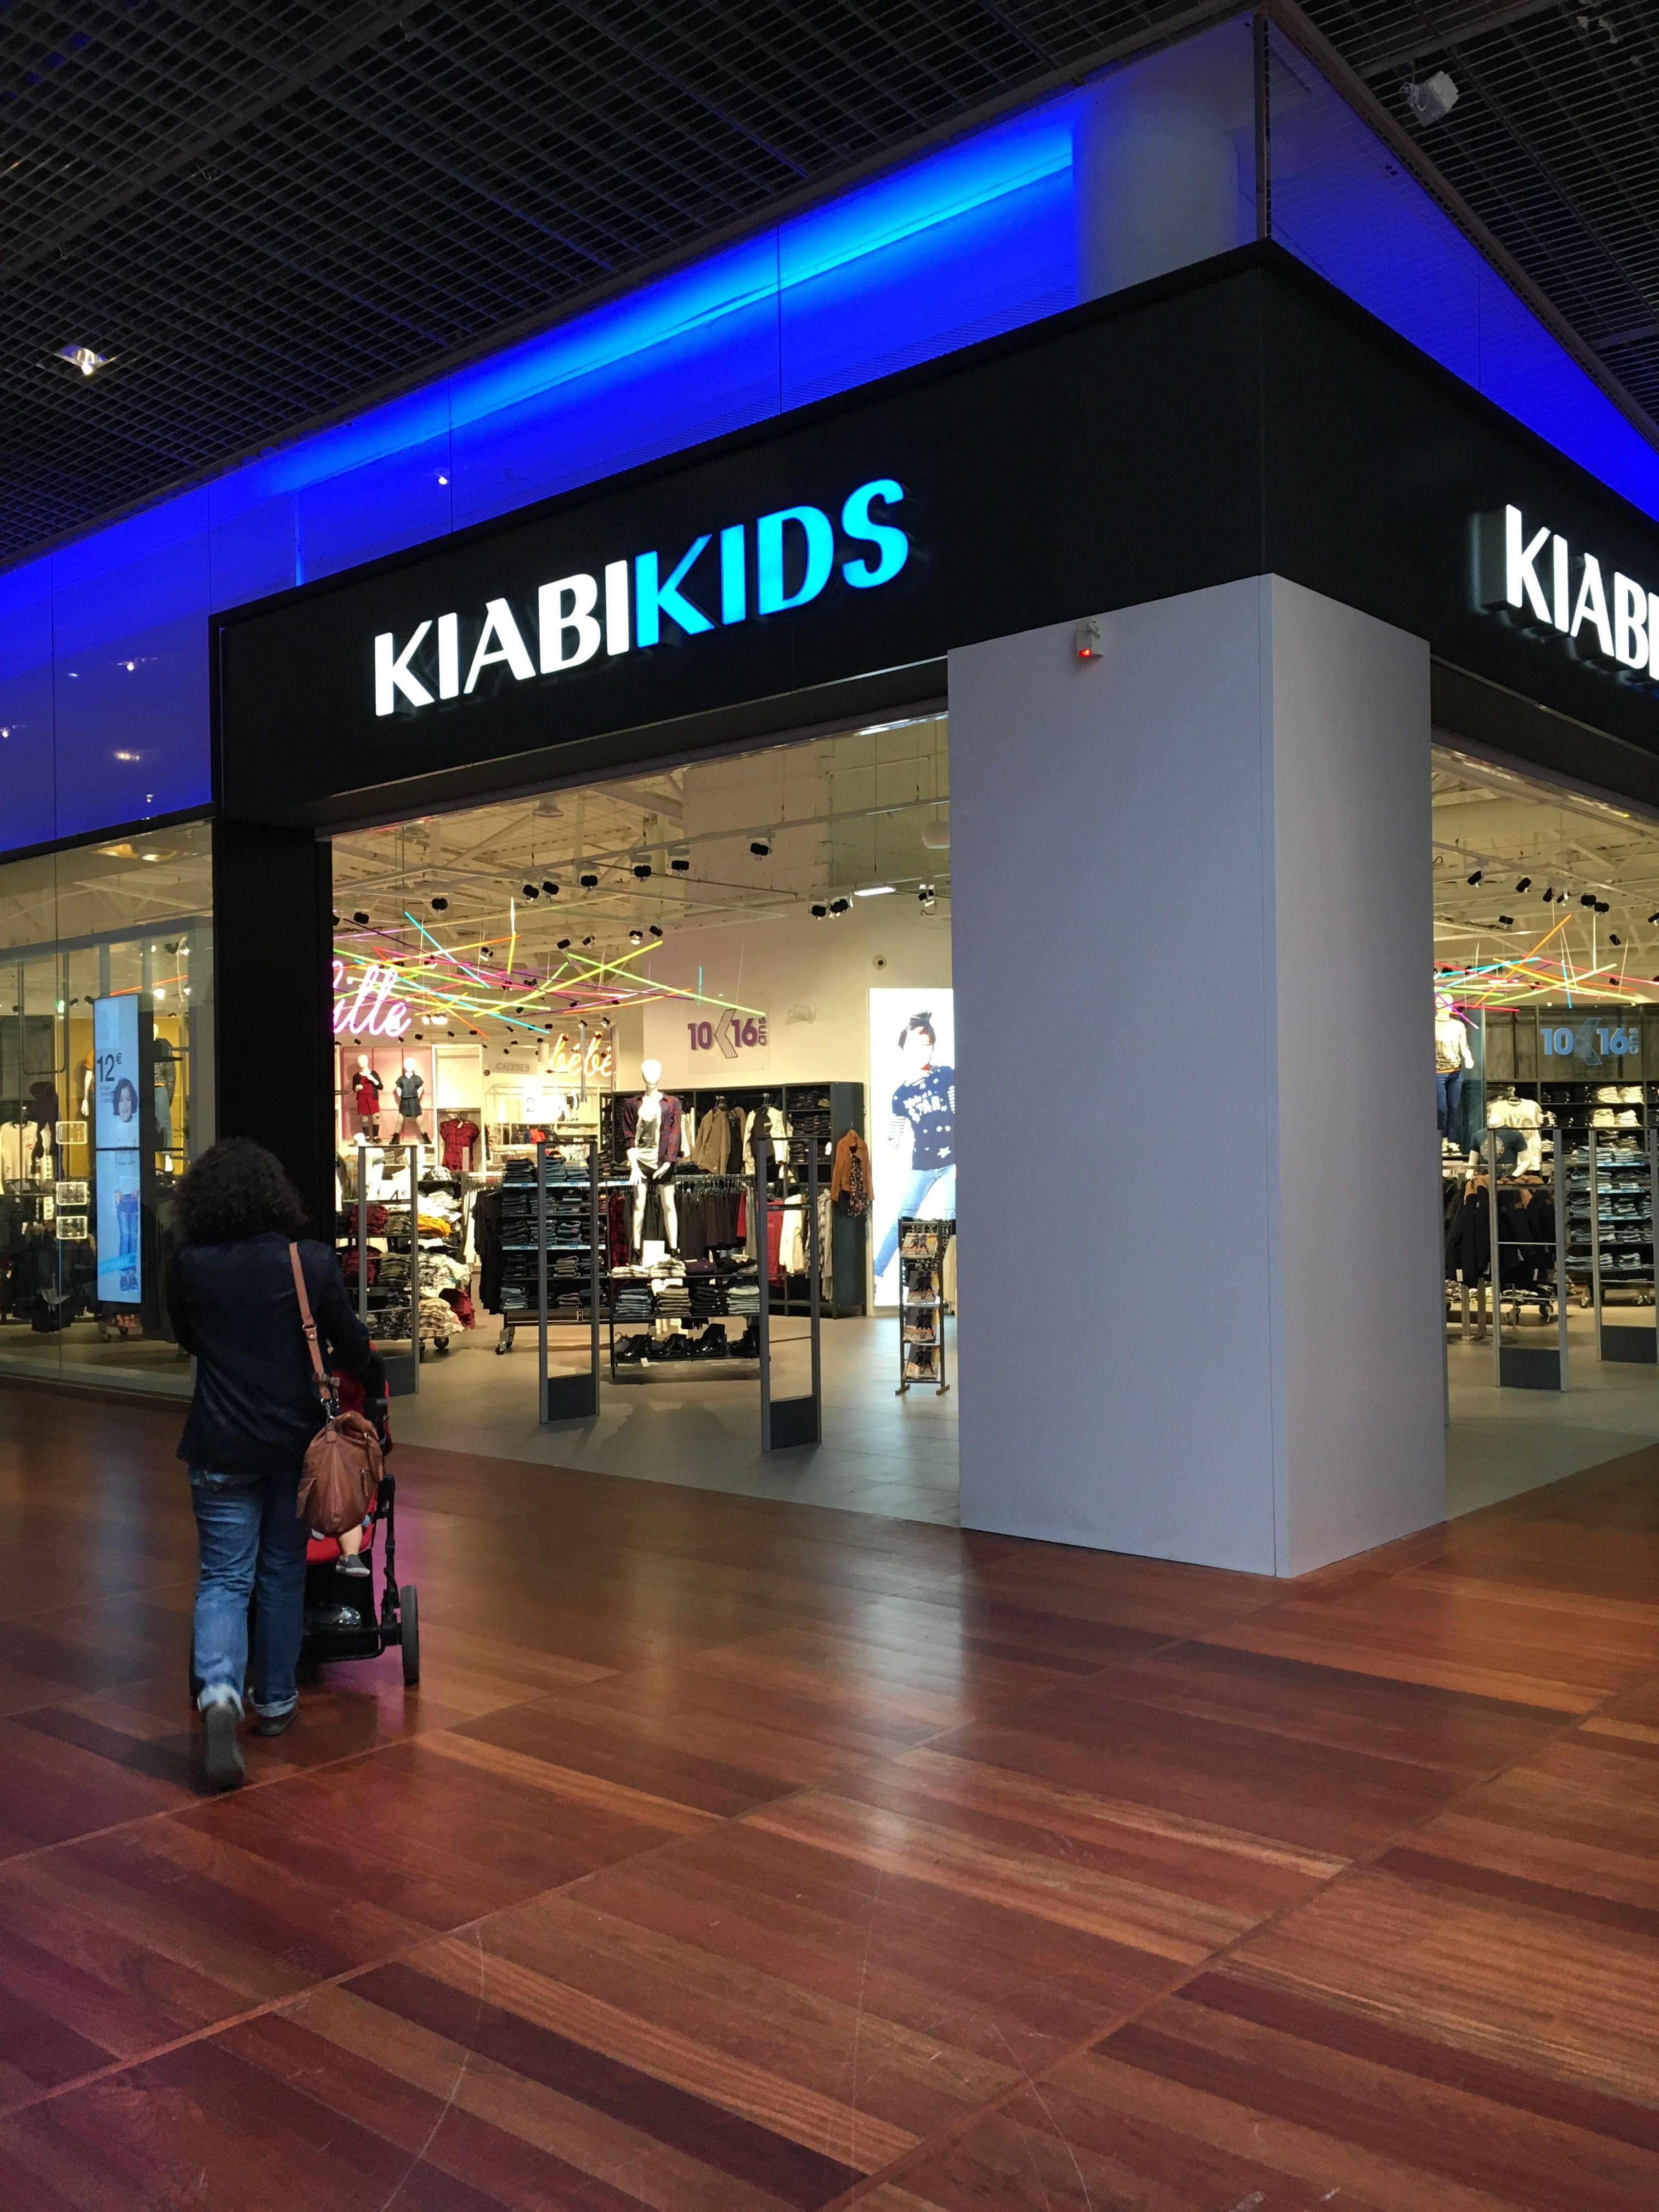 e2a76677d06 Kiabi kids - Euralille - Septembre 2016